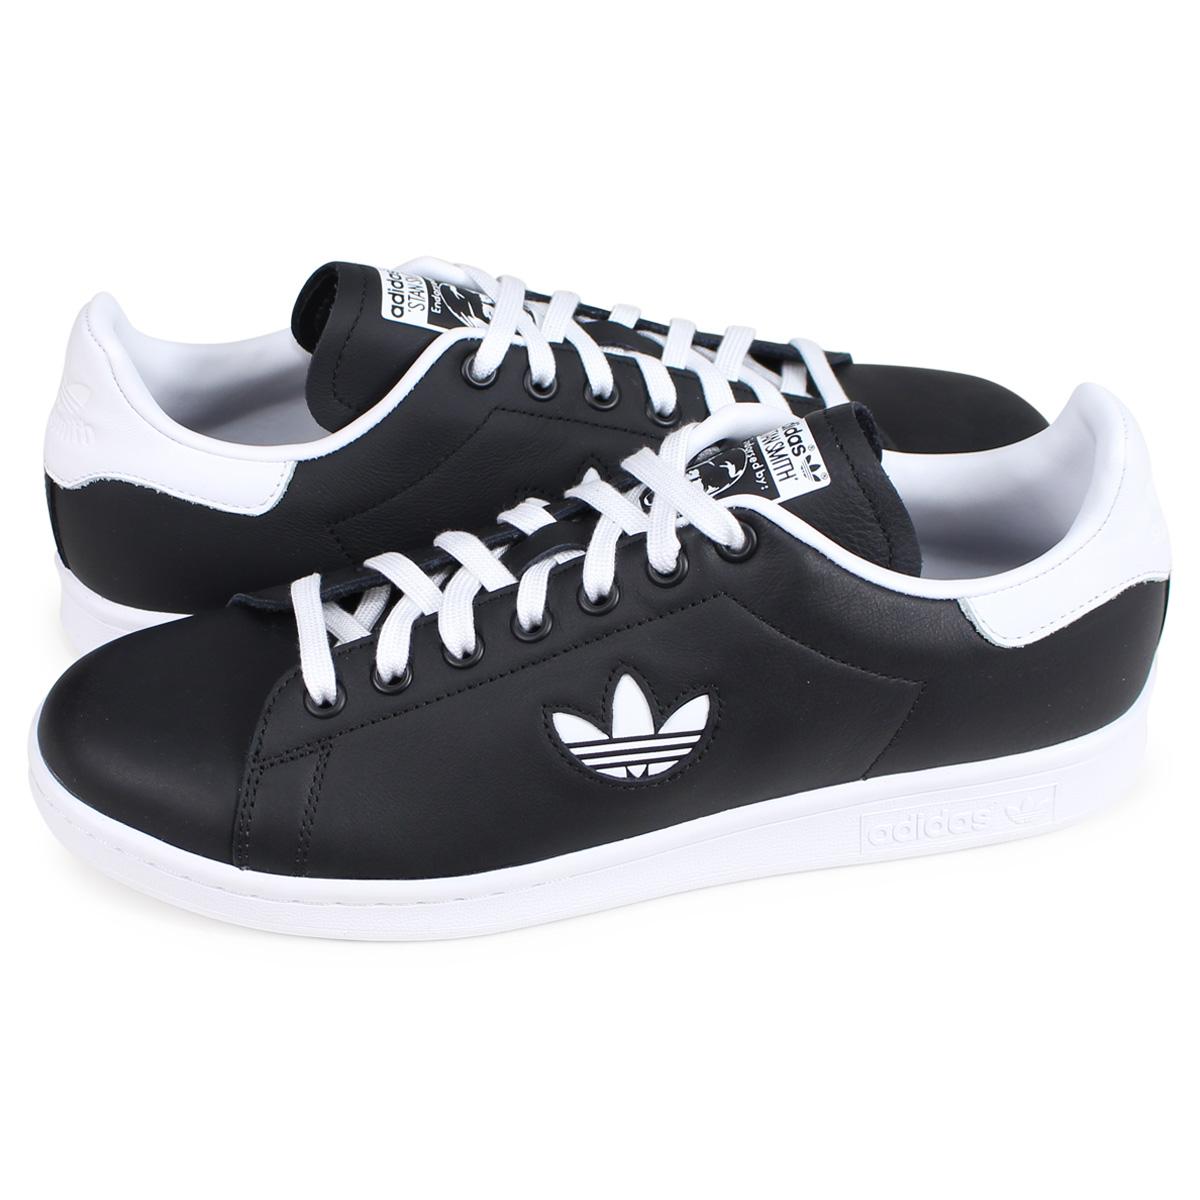 adidas Originals STAN SMITH アディダス オリジナルス スタンスミス スニーカー メンズ レディース ブラック 黒 BD7452 [3/26 新入荷]